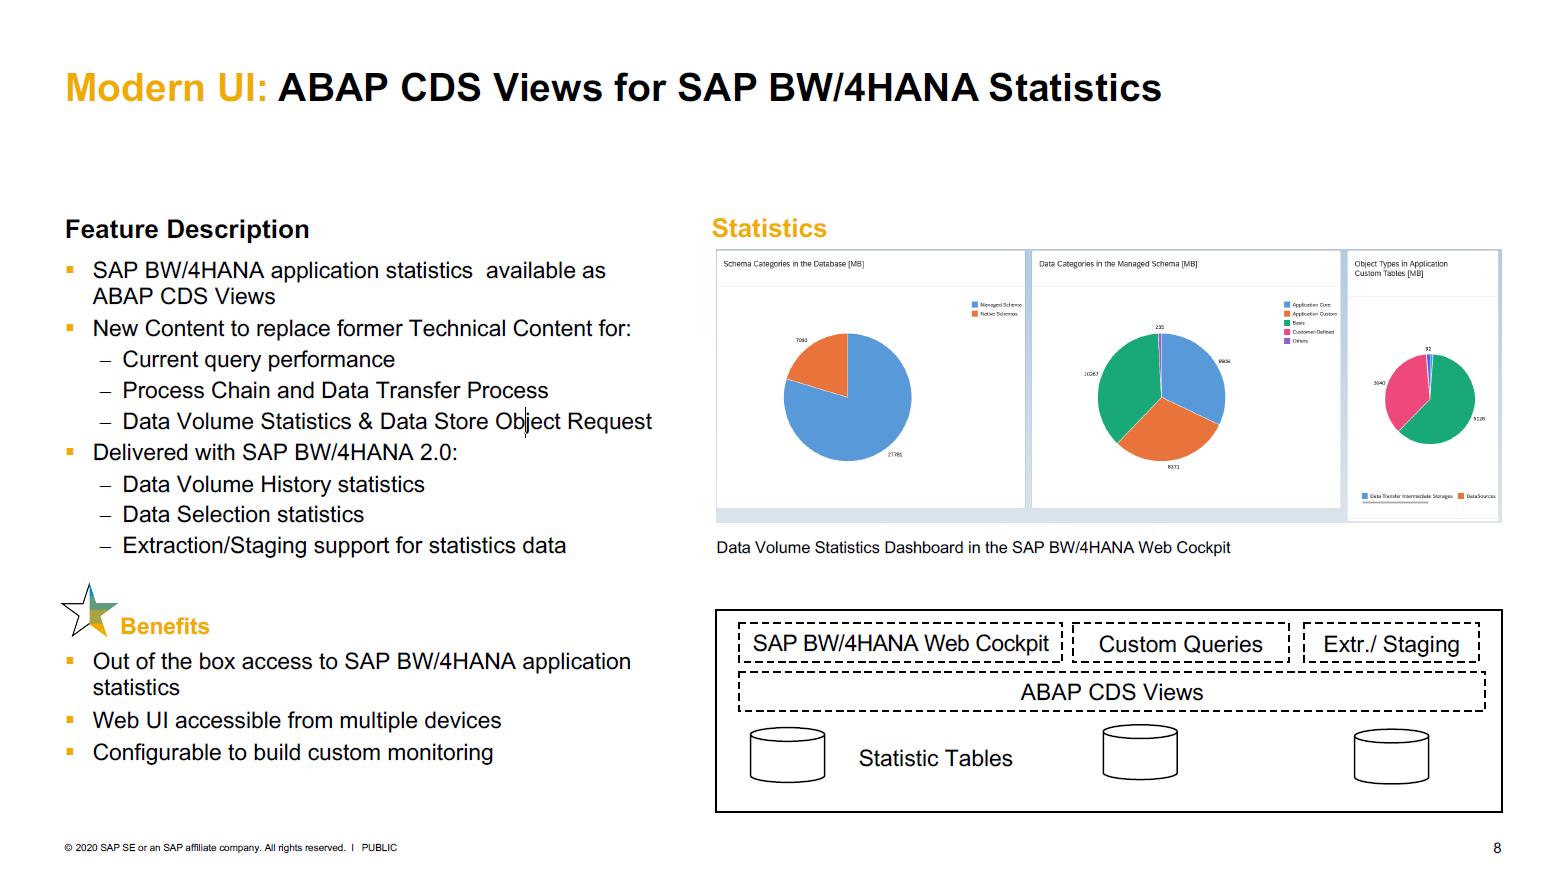 SAP CDS Views for SAP W/4HANA Statistics